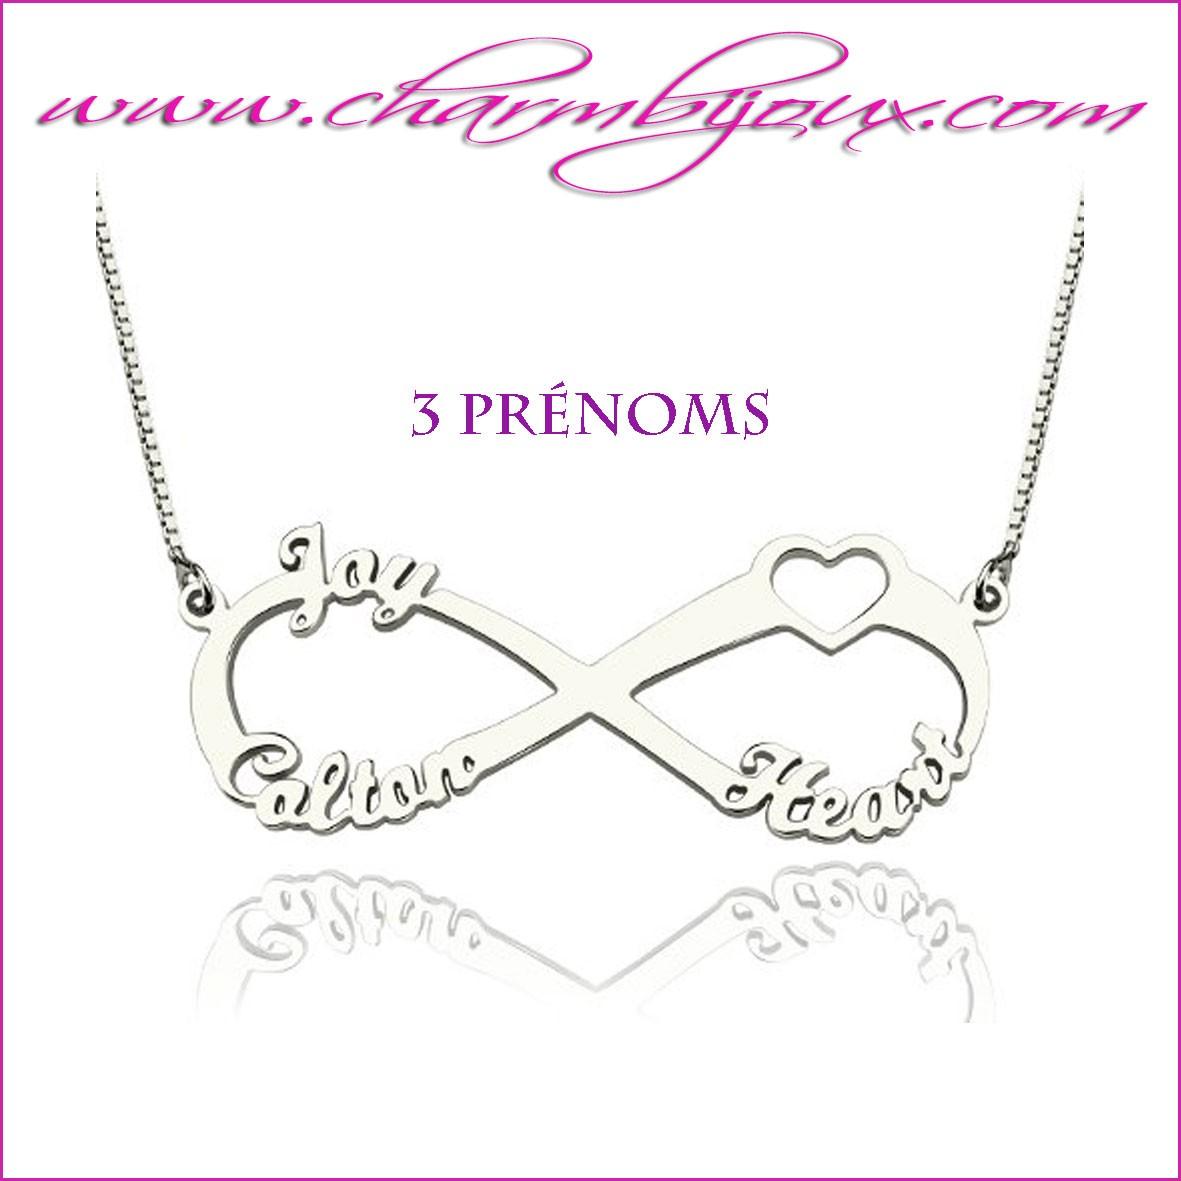 collier avec 3 prenoms